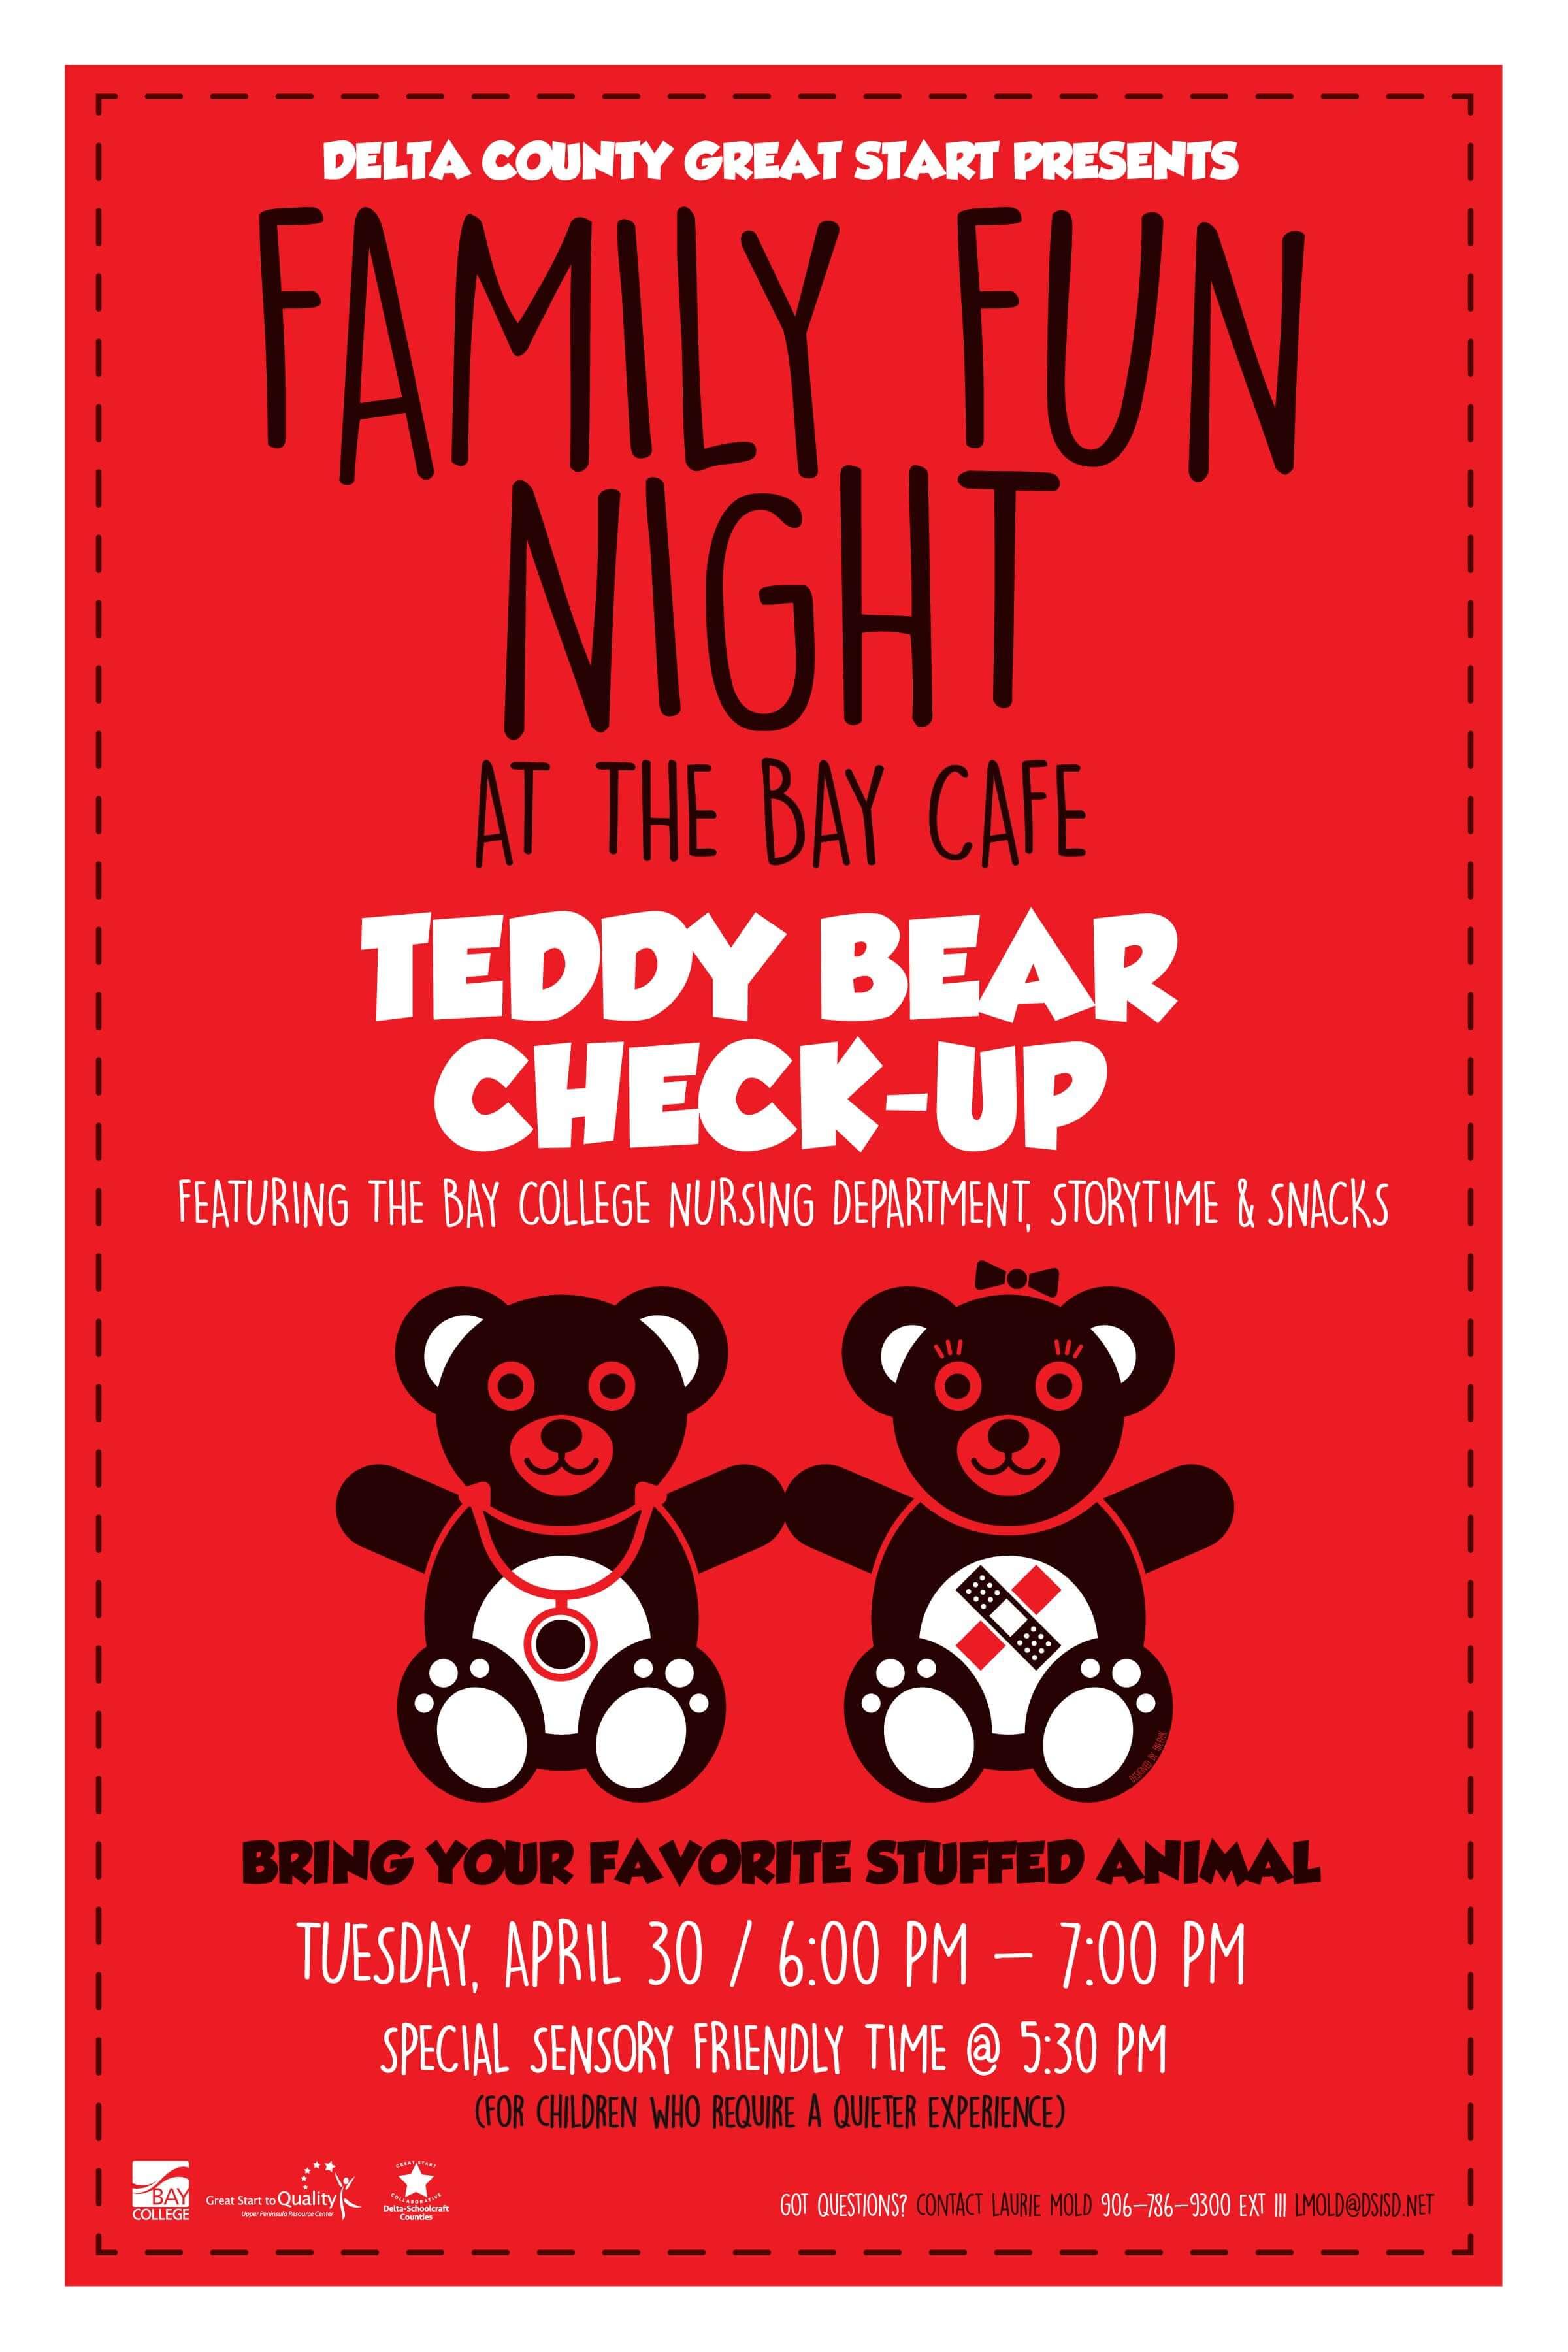 Great Start Teddy Bear Checkup 4-30-19